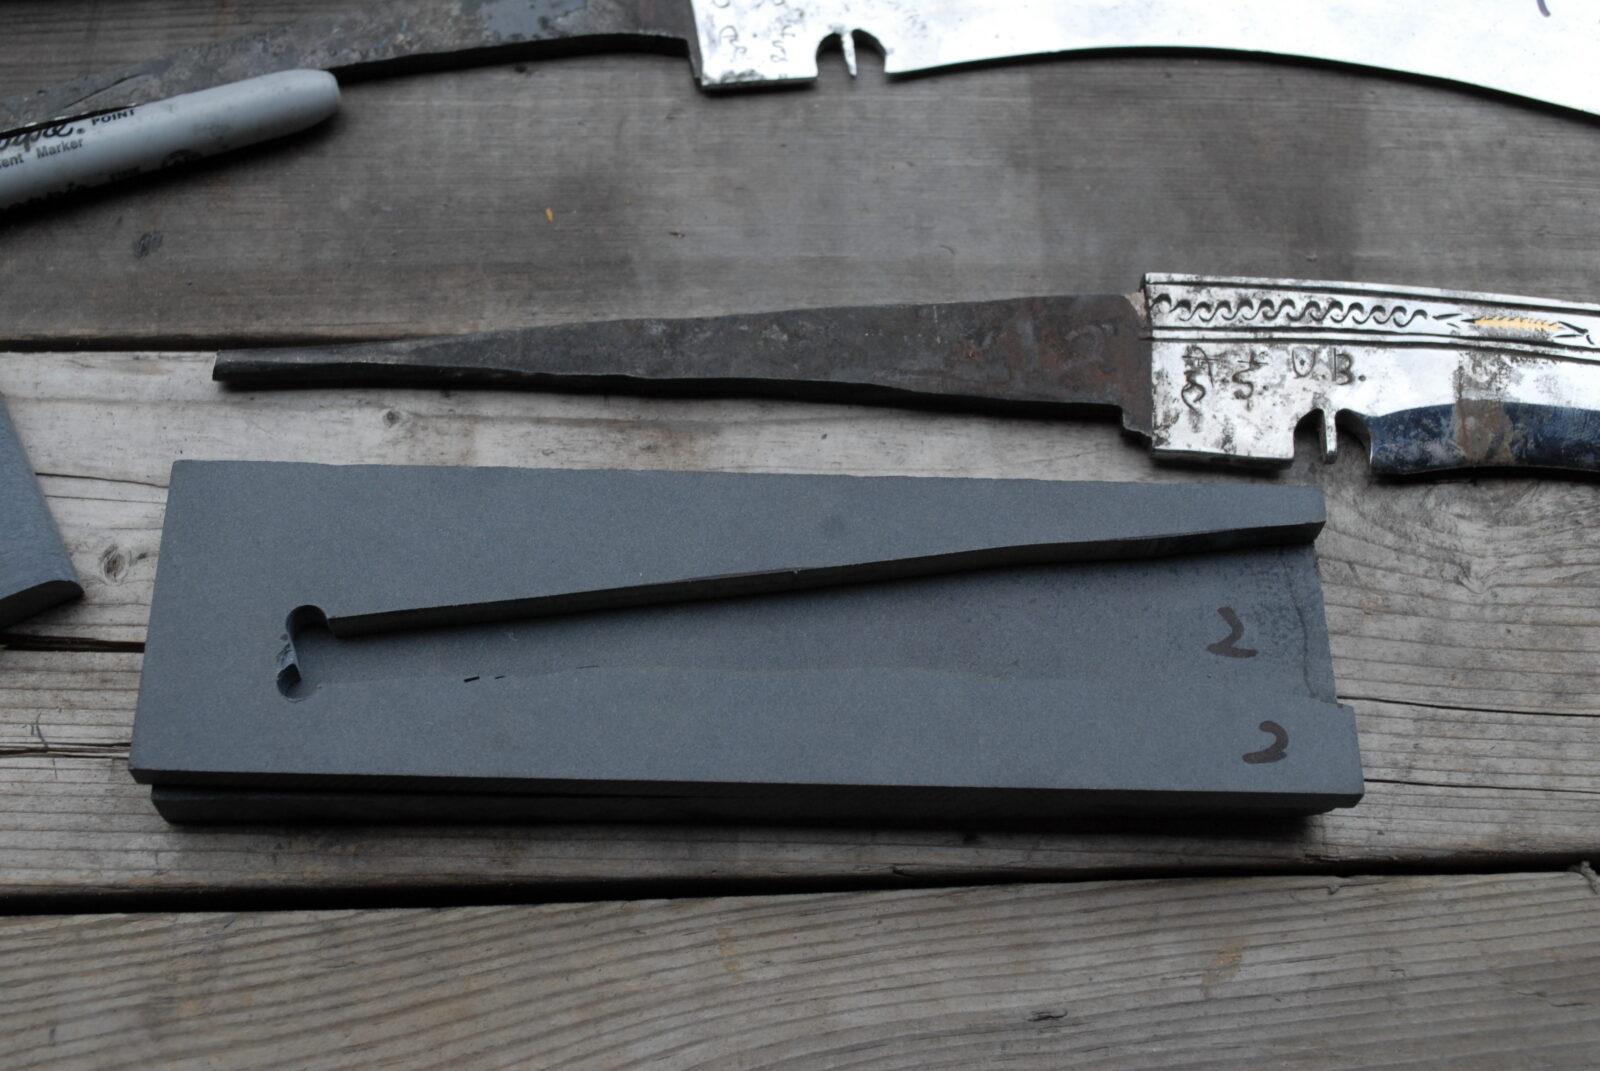 How to make a custom khukuri handle for a rat tang with micarta and epoxy